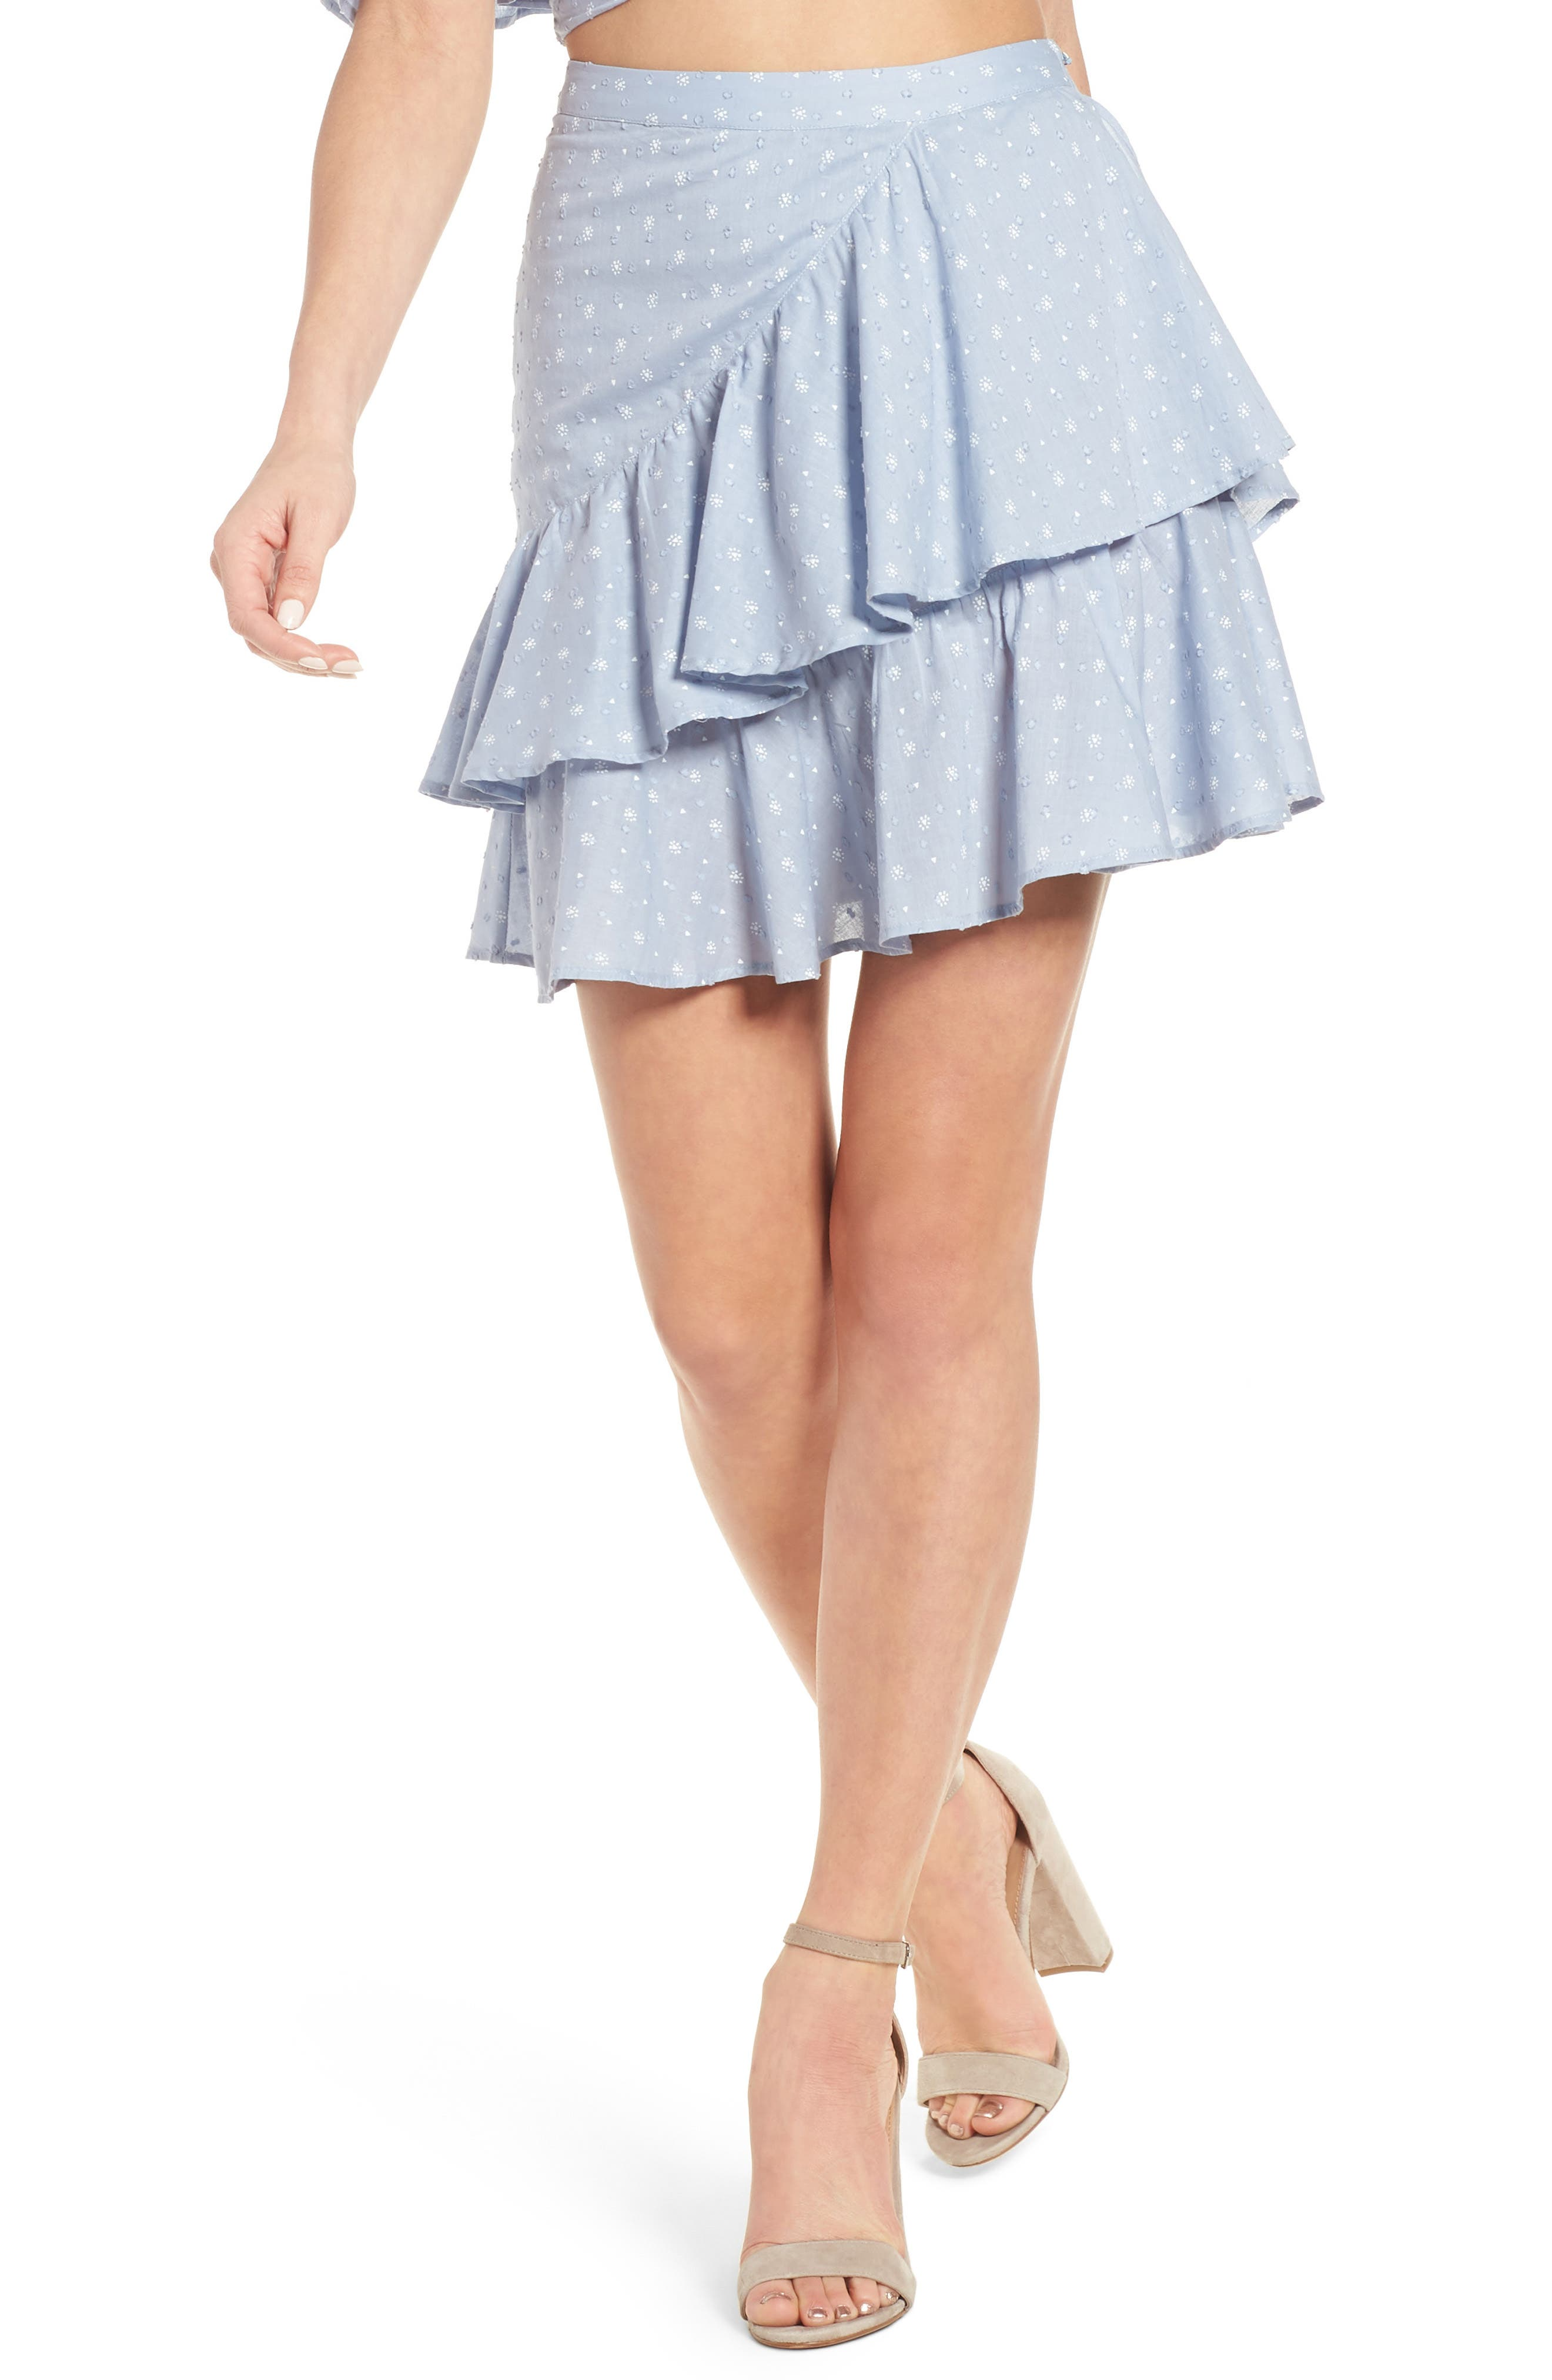 Mara Ruffled Miniskirt,                             Main thumbnail 1, color,                             Sail Blue